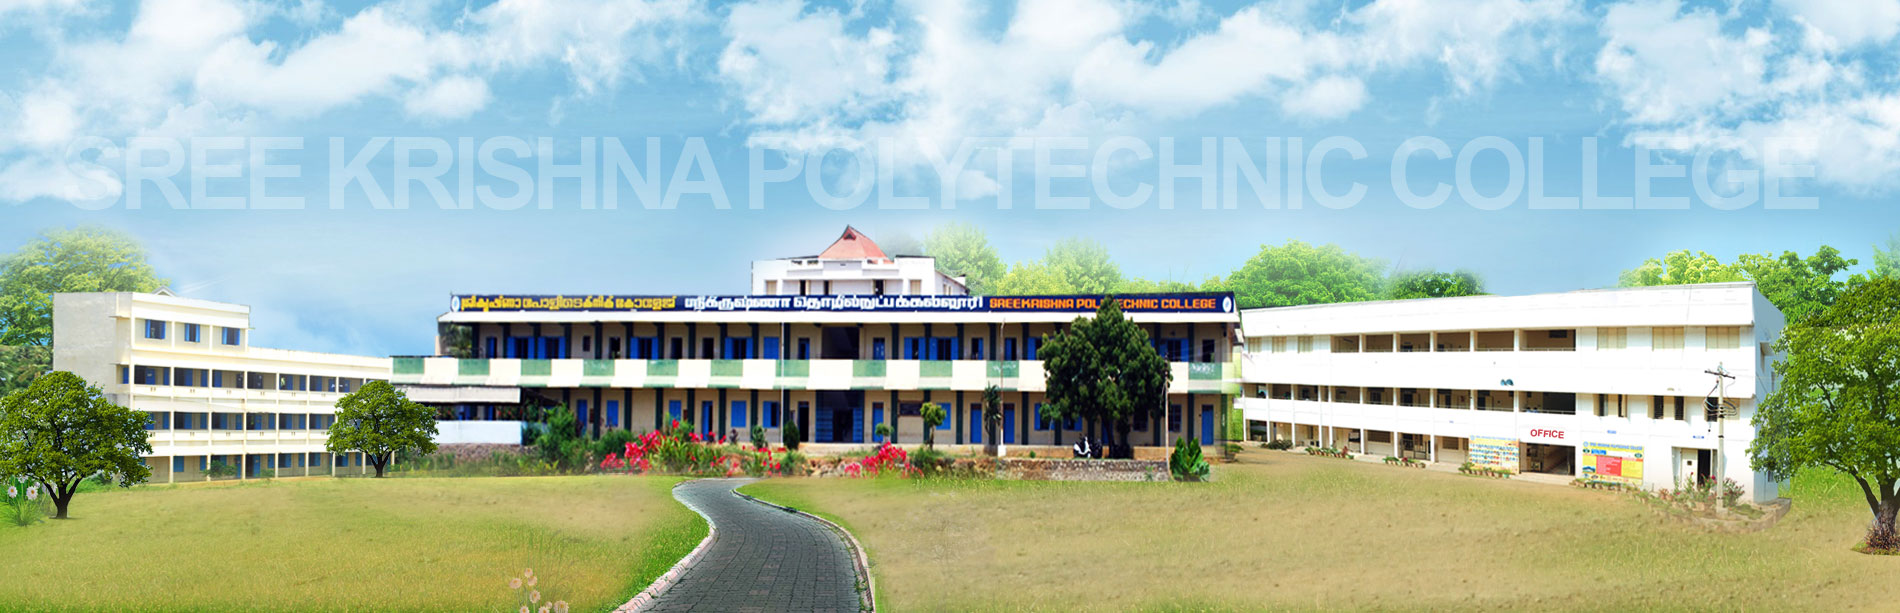 sree krishna polytechnic college